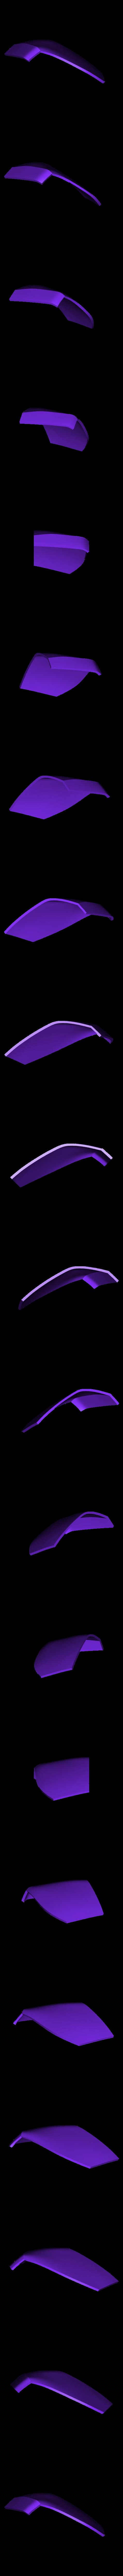 Part_8.stl Download free STL file Red Hood Helmet (Batman) • 3D printer object, VillainousPropShop